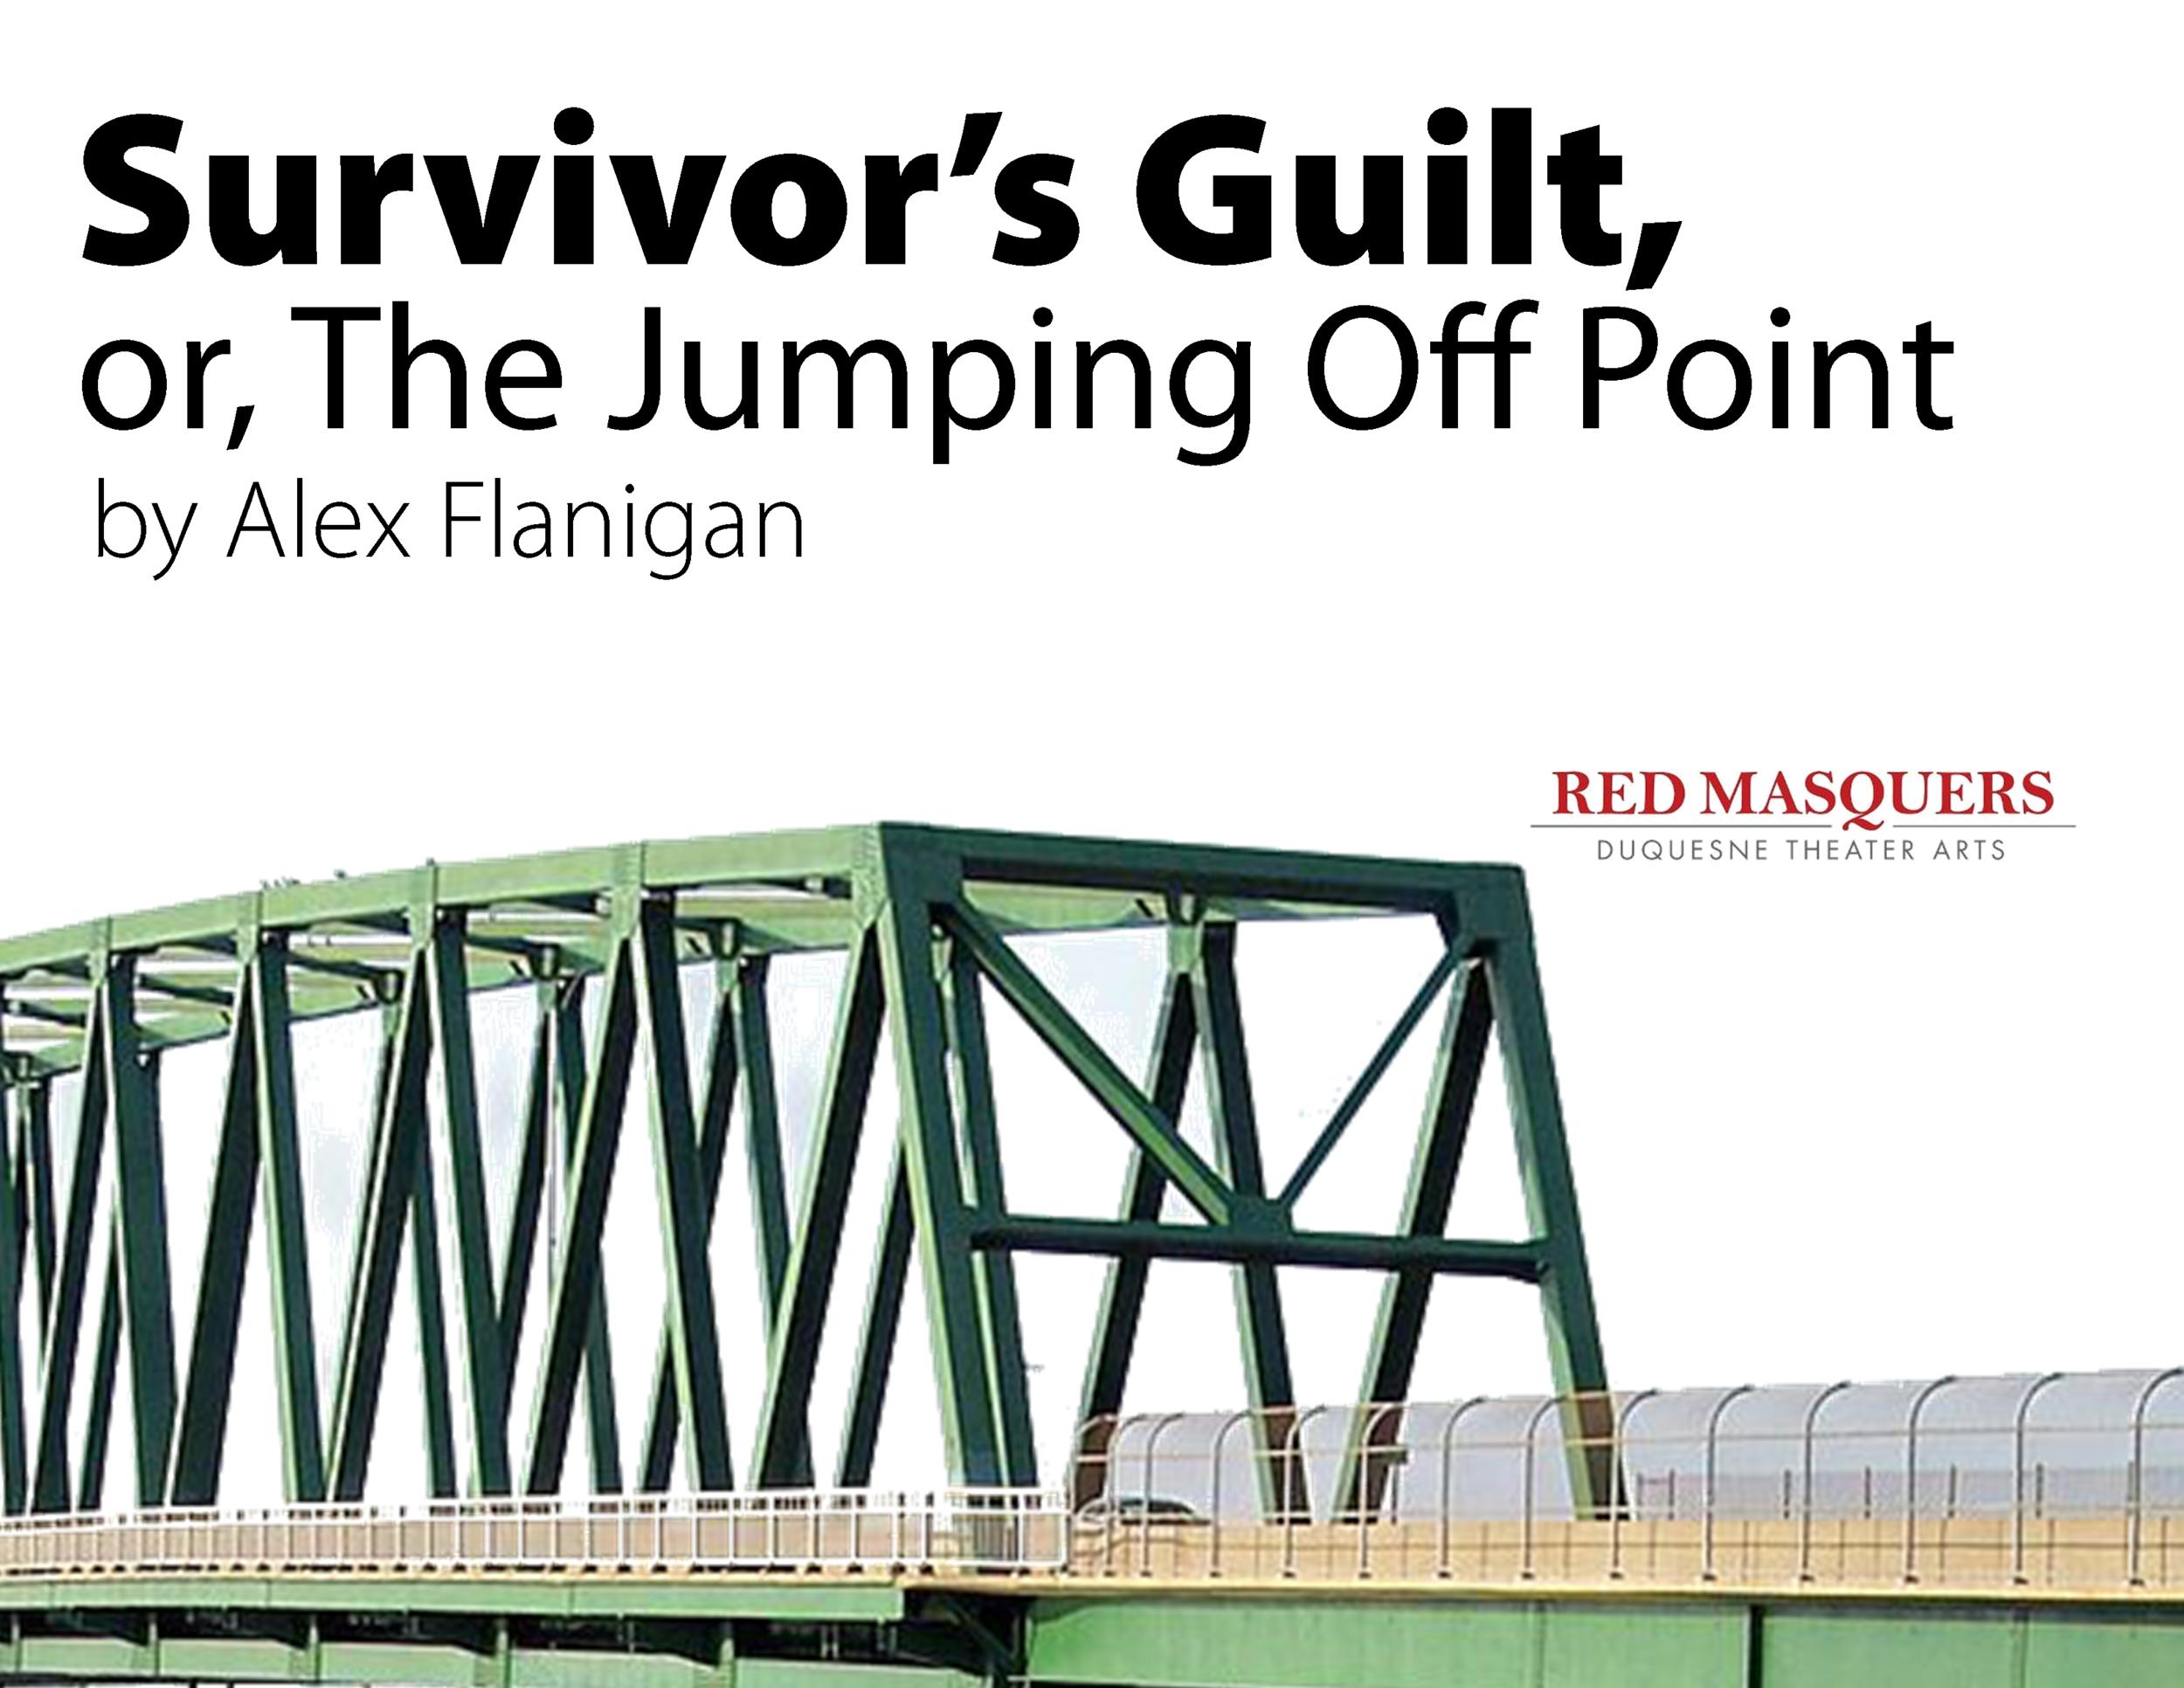 Survivors Guilt Poster.png